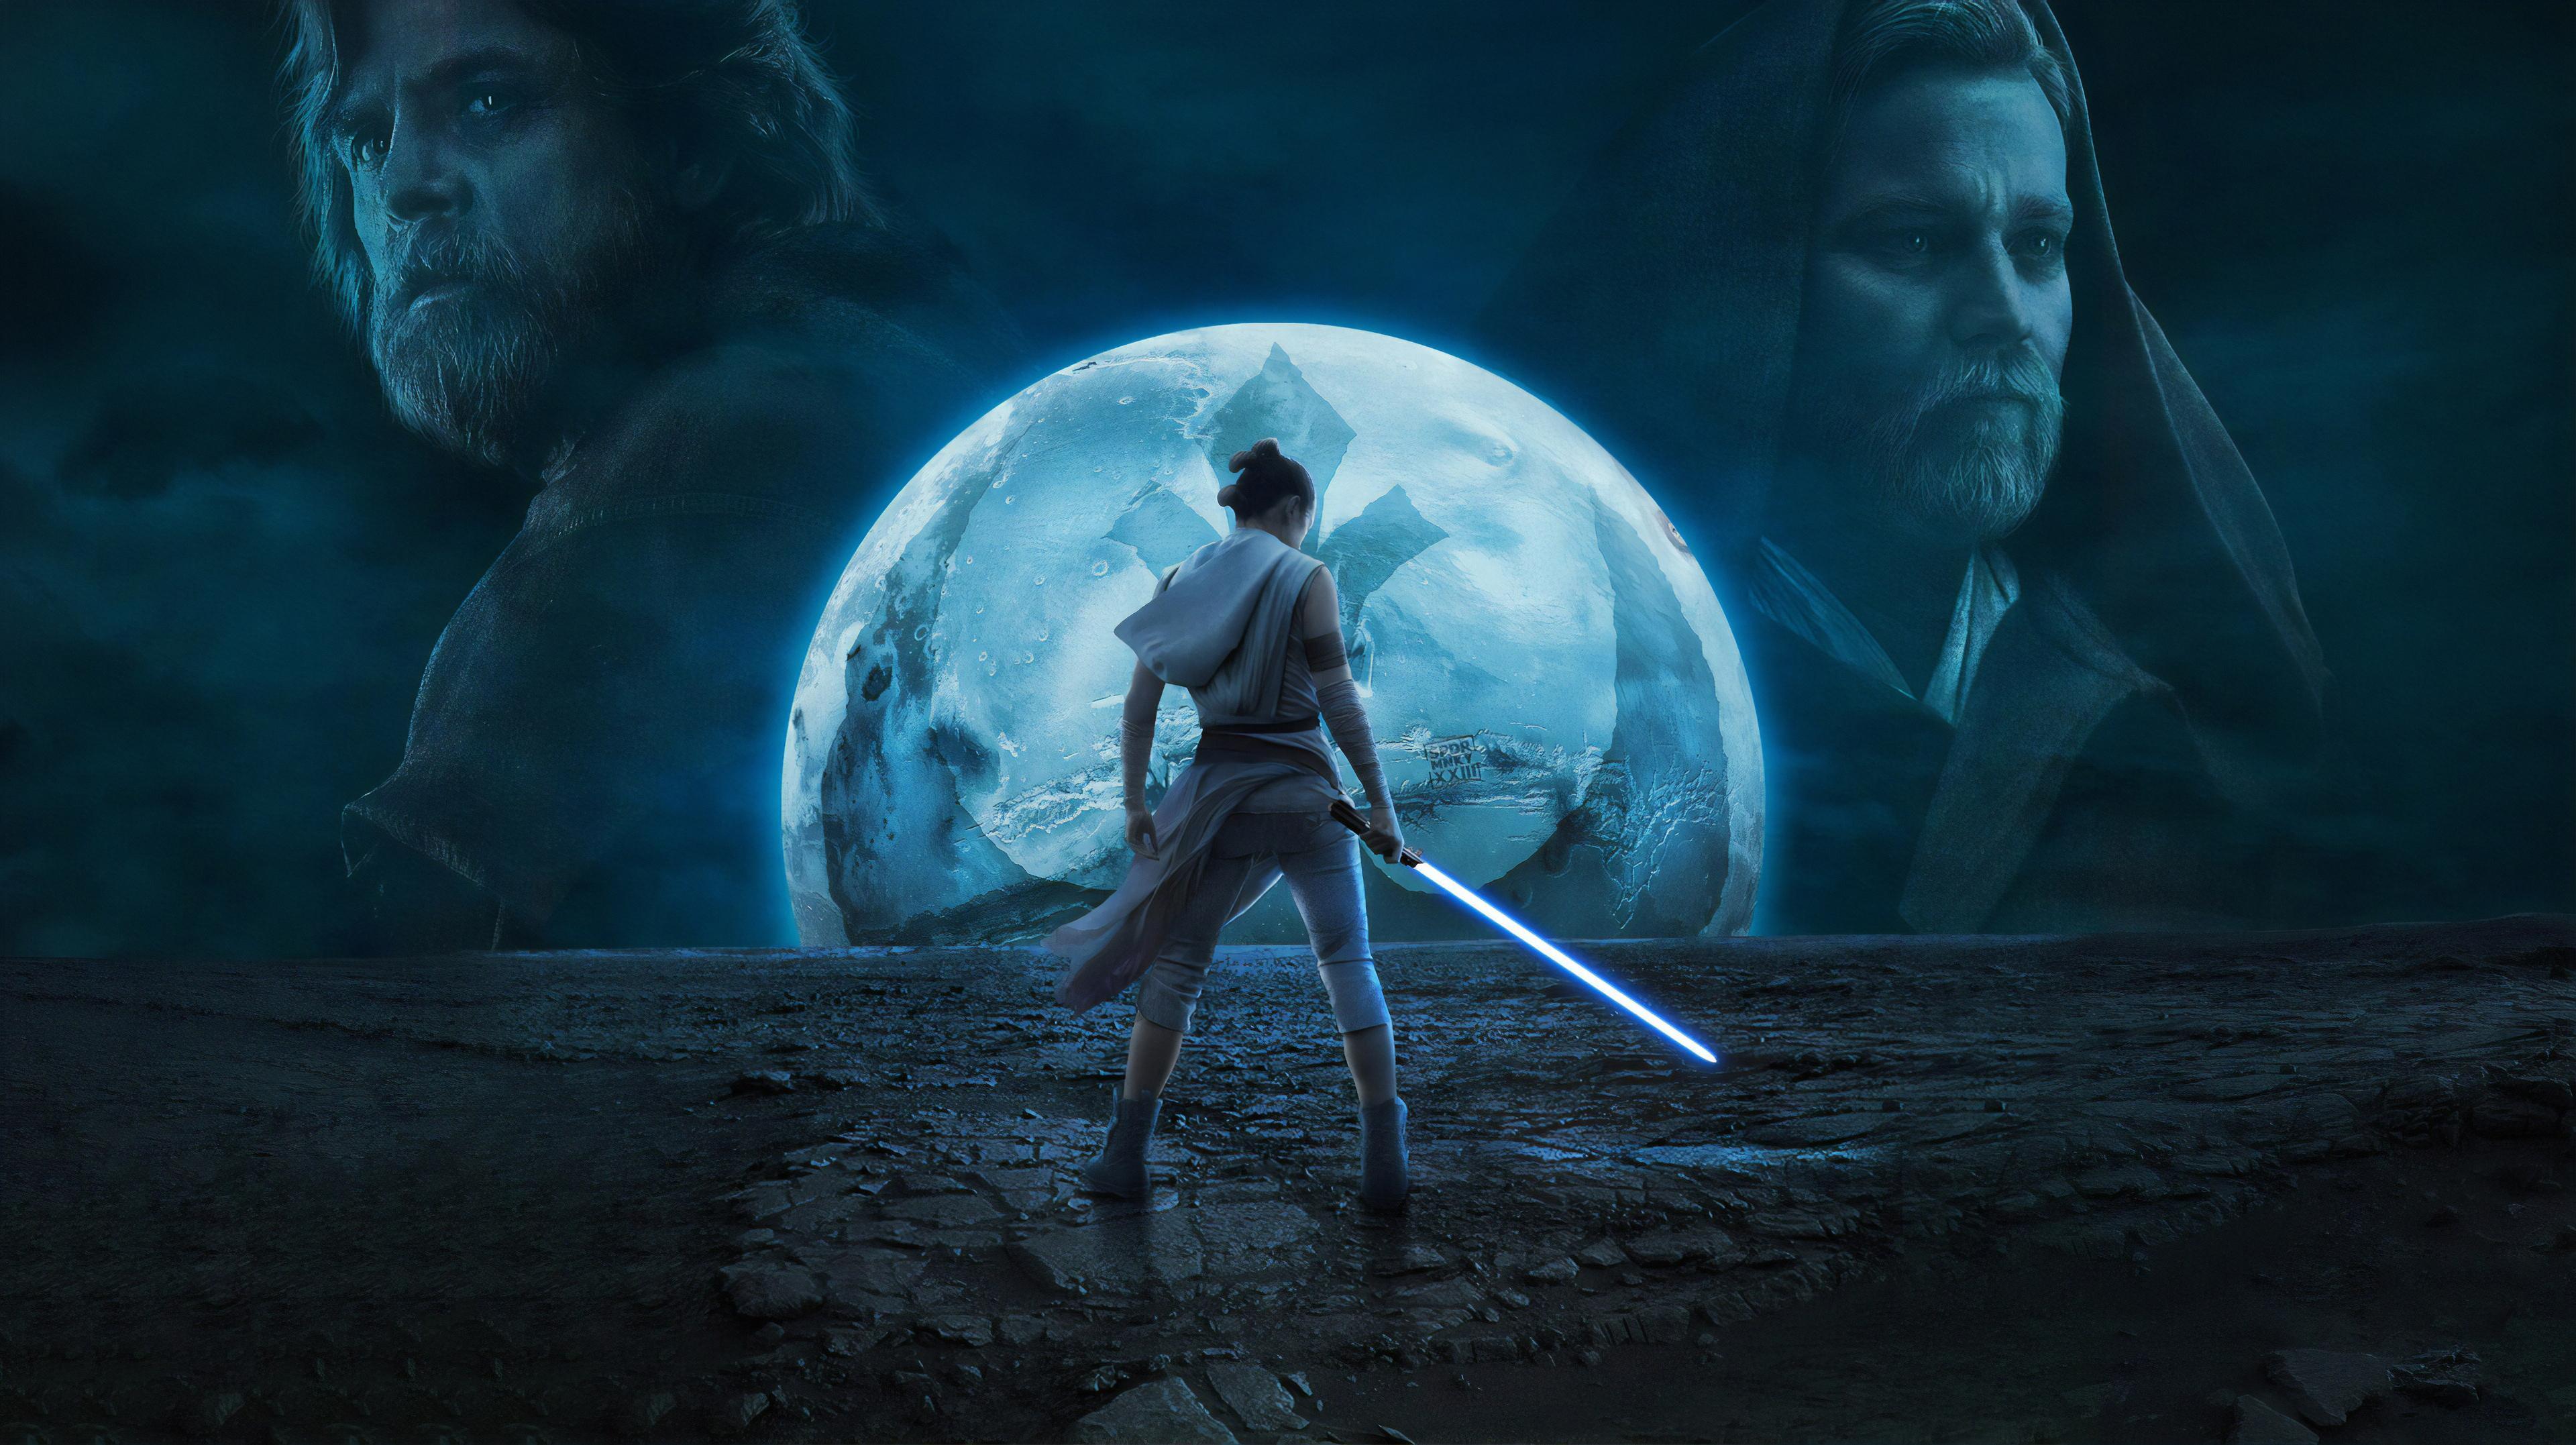 Star Wars Desktop Rise Of Skywalker Wallpapers - Wallpaper ...